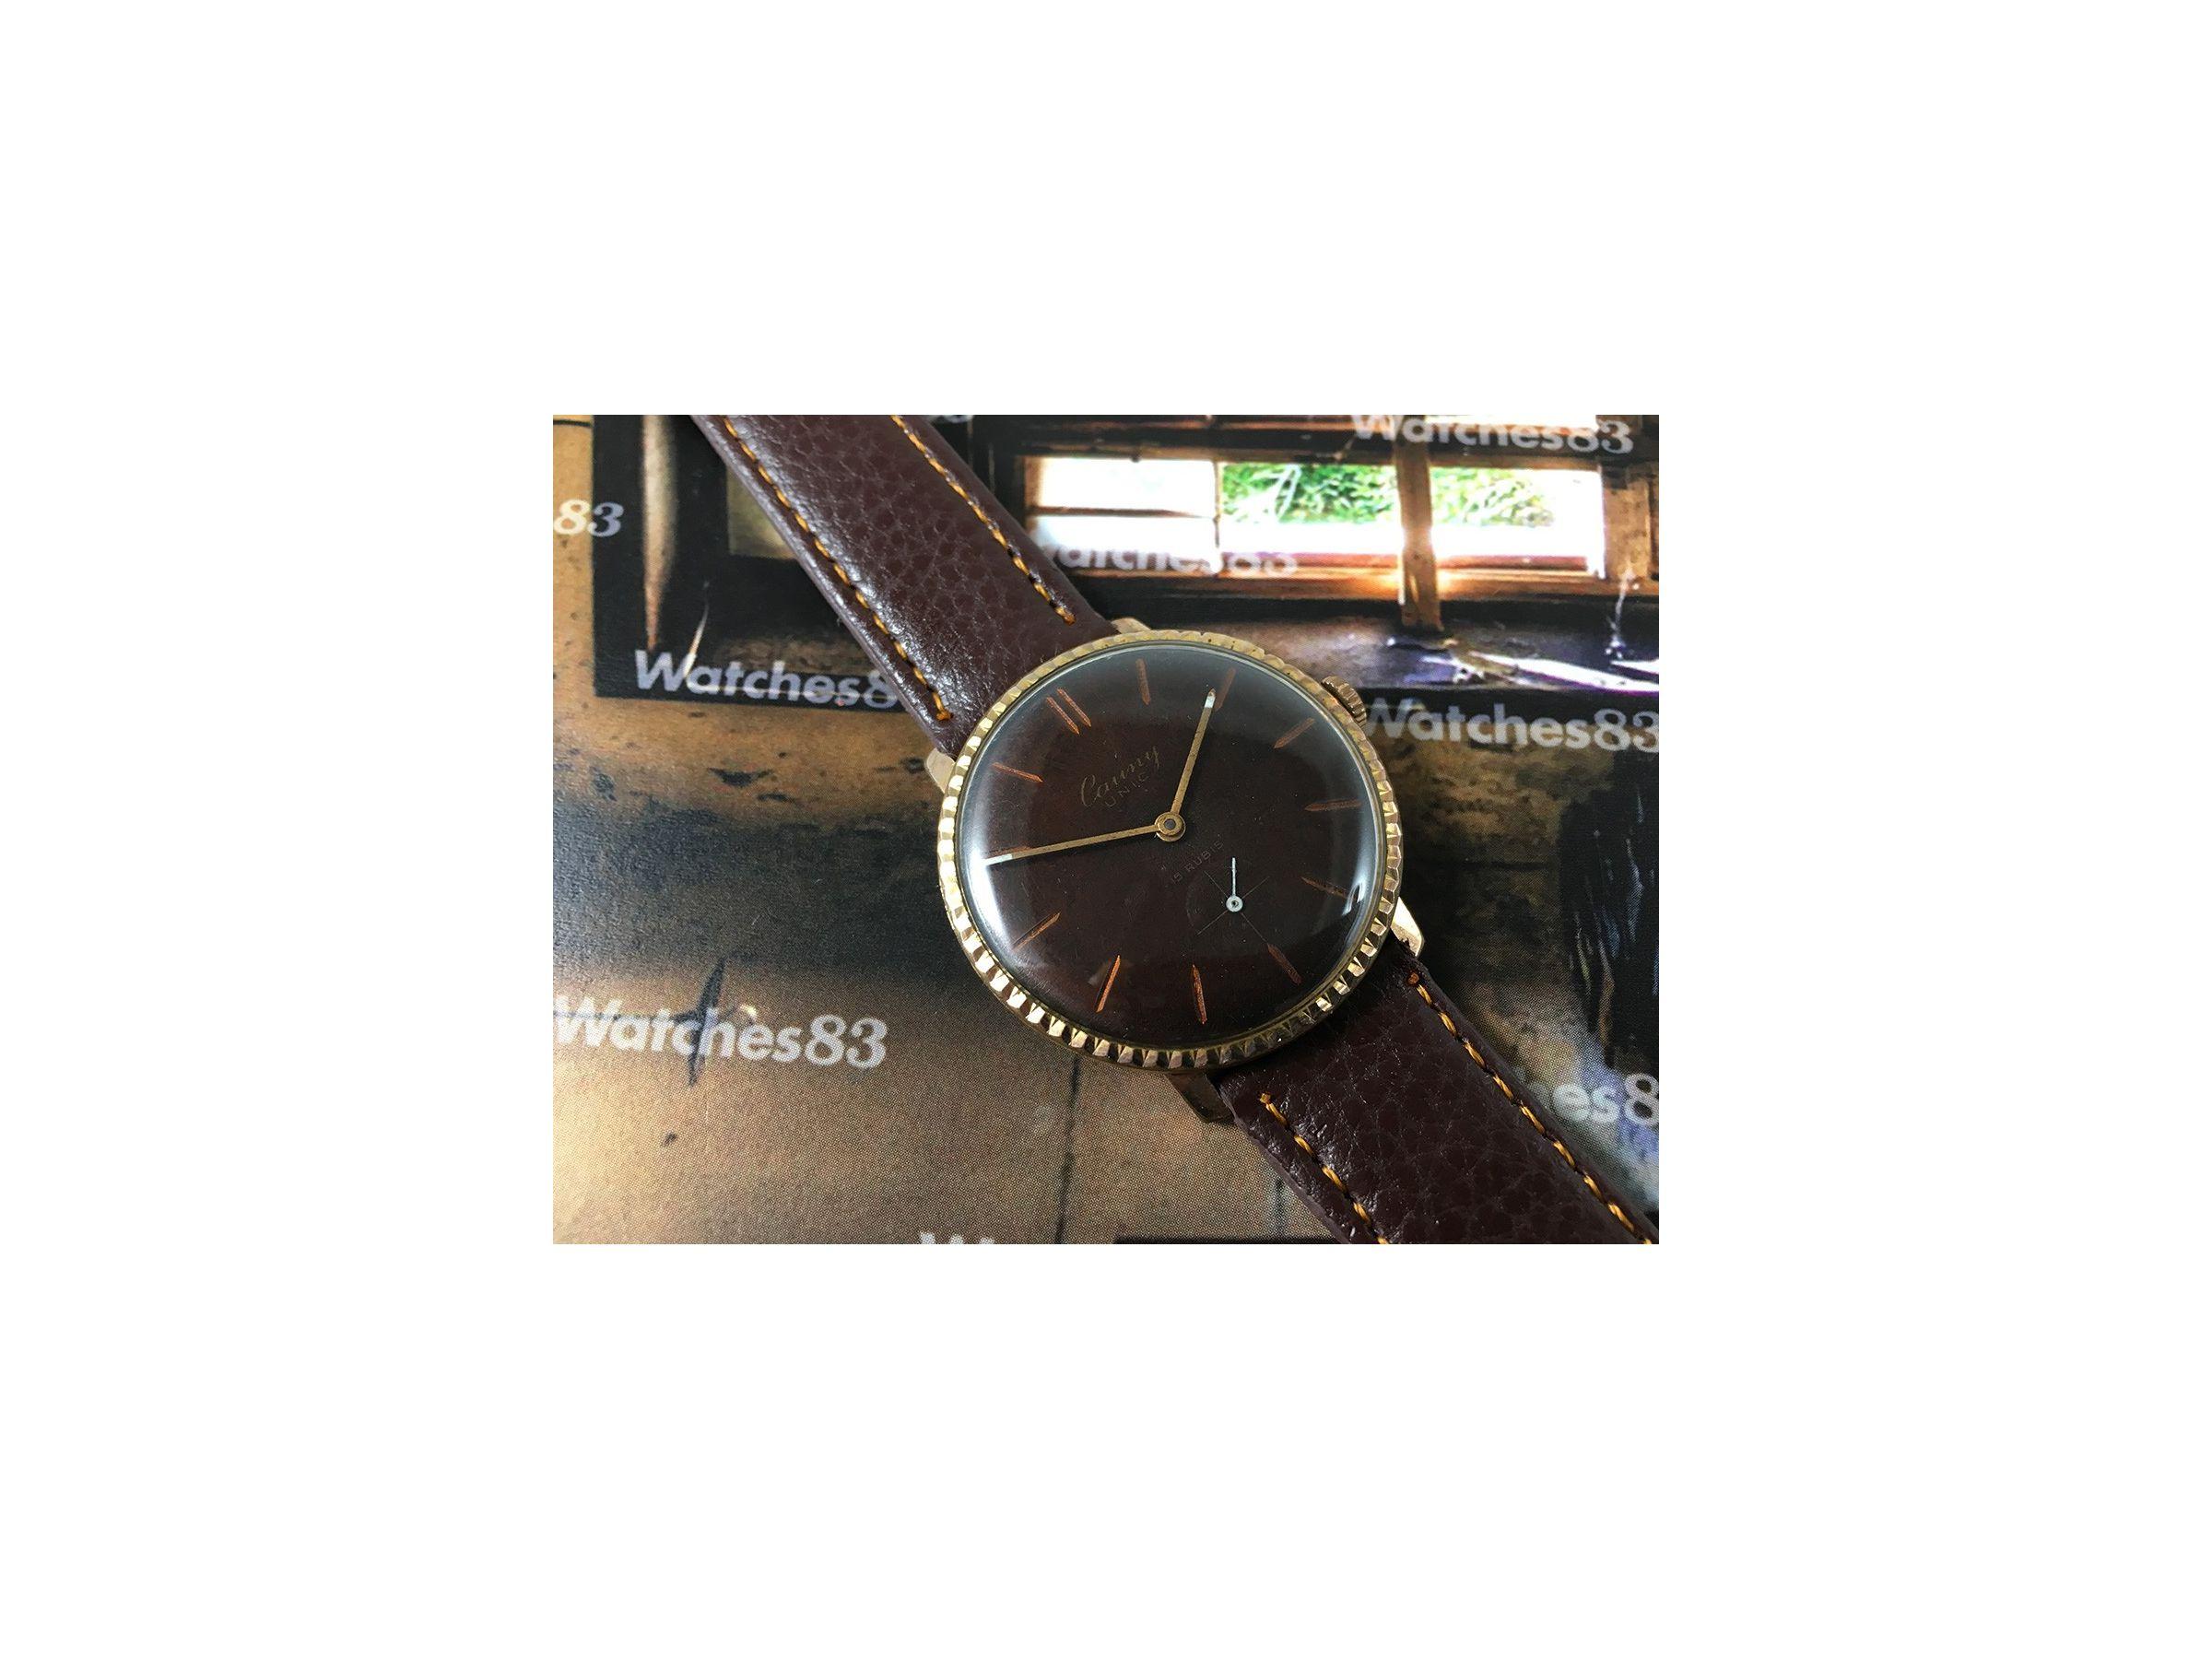 Reloj Suizo De Cuerda Antiguo Cauny Unic 15 Rubis Watches83